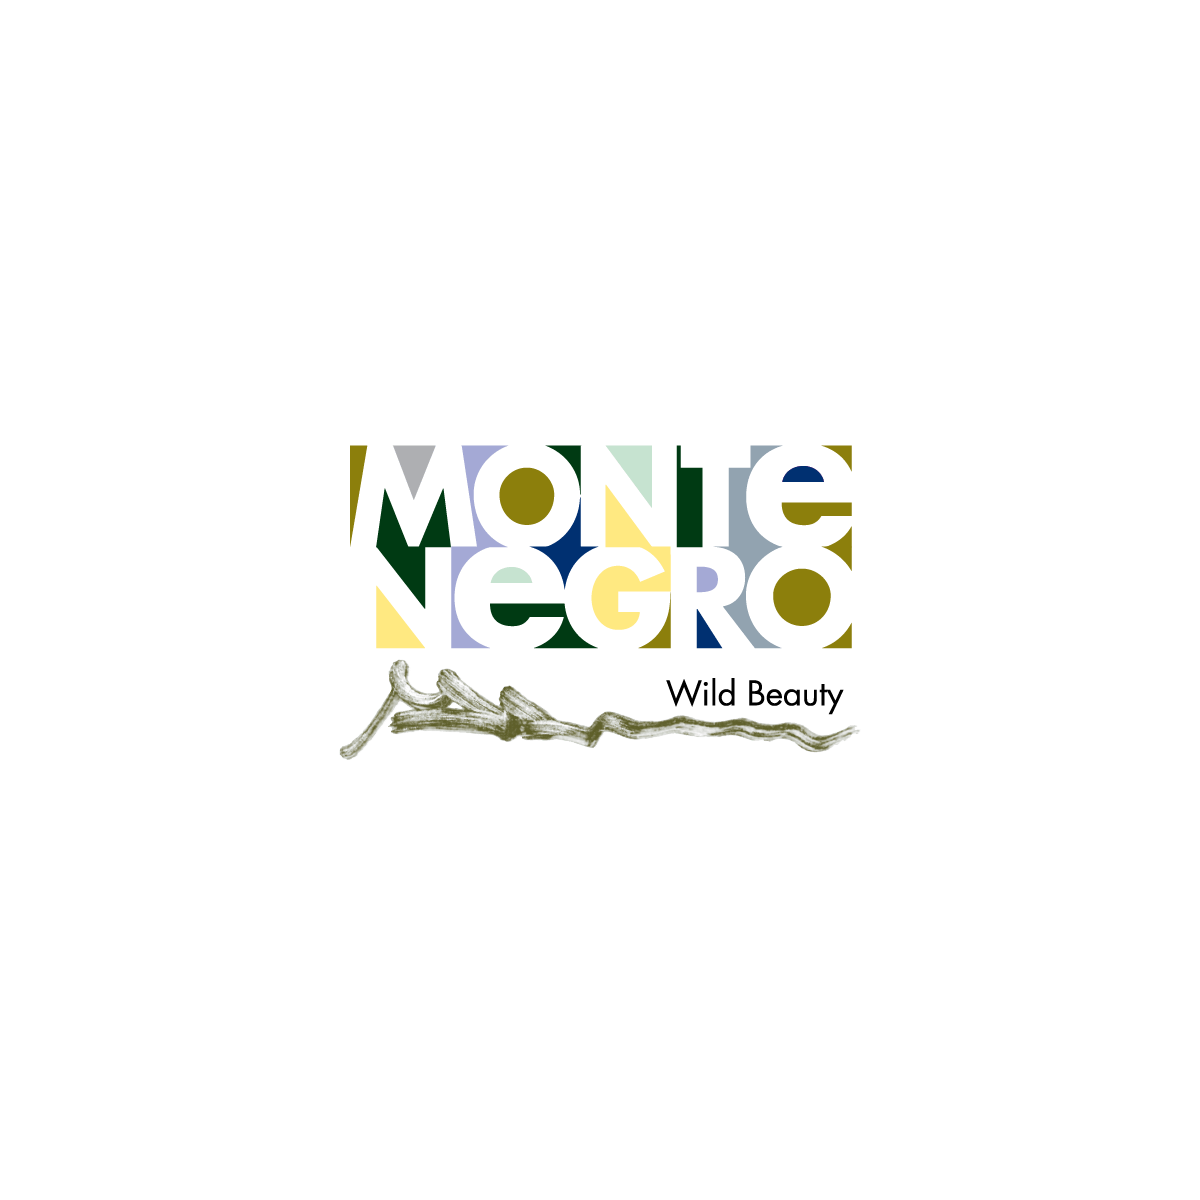 intermar-marketing-corporate-design-montenegro-wild-beauty-logo.png